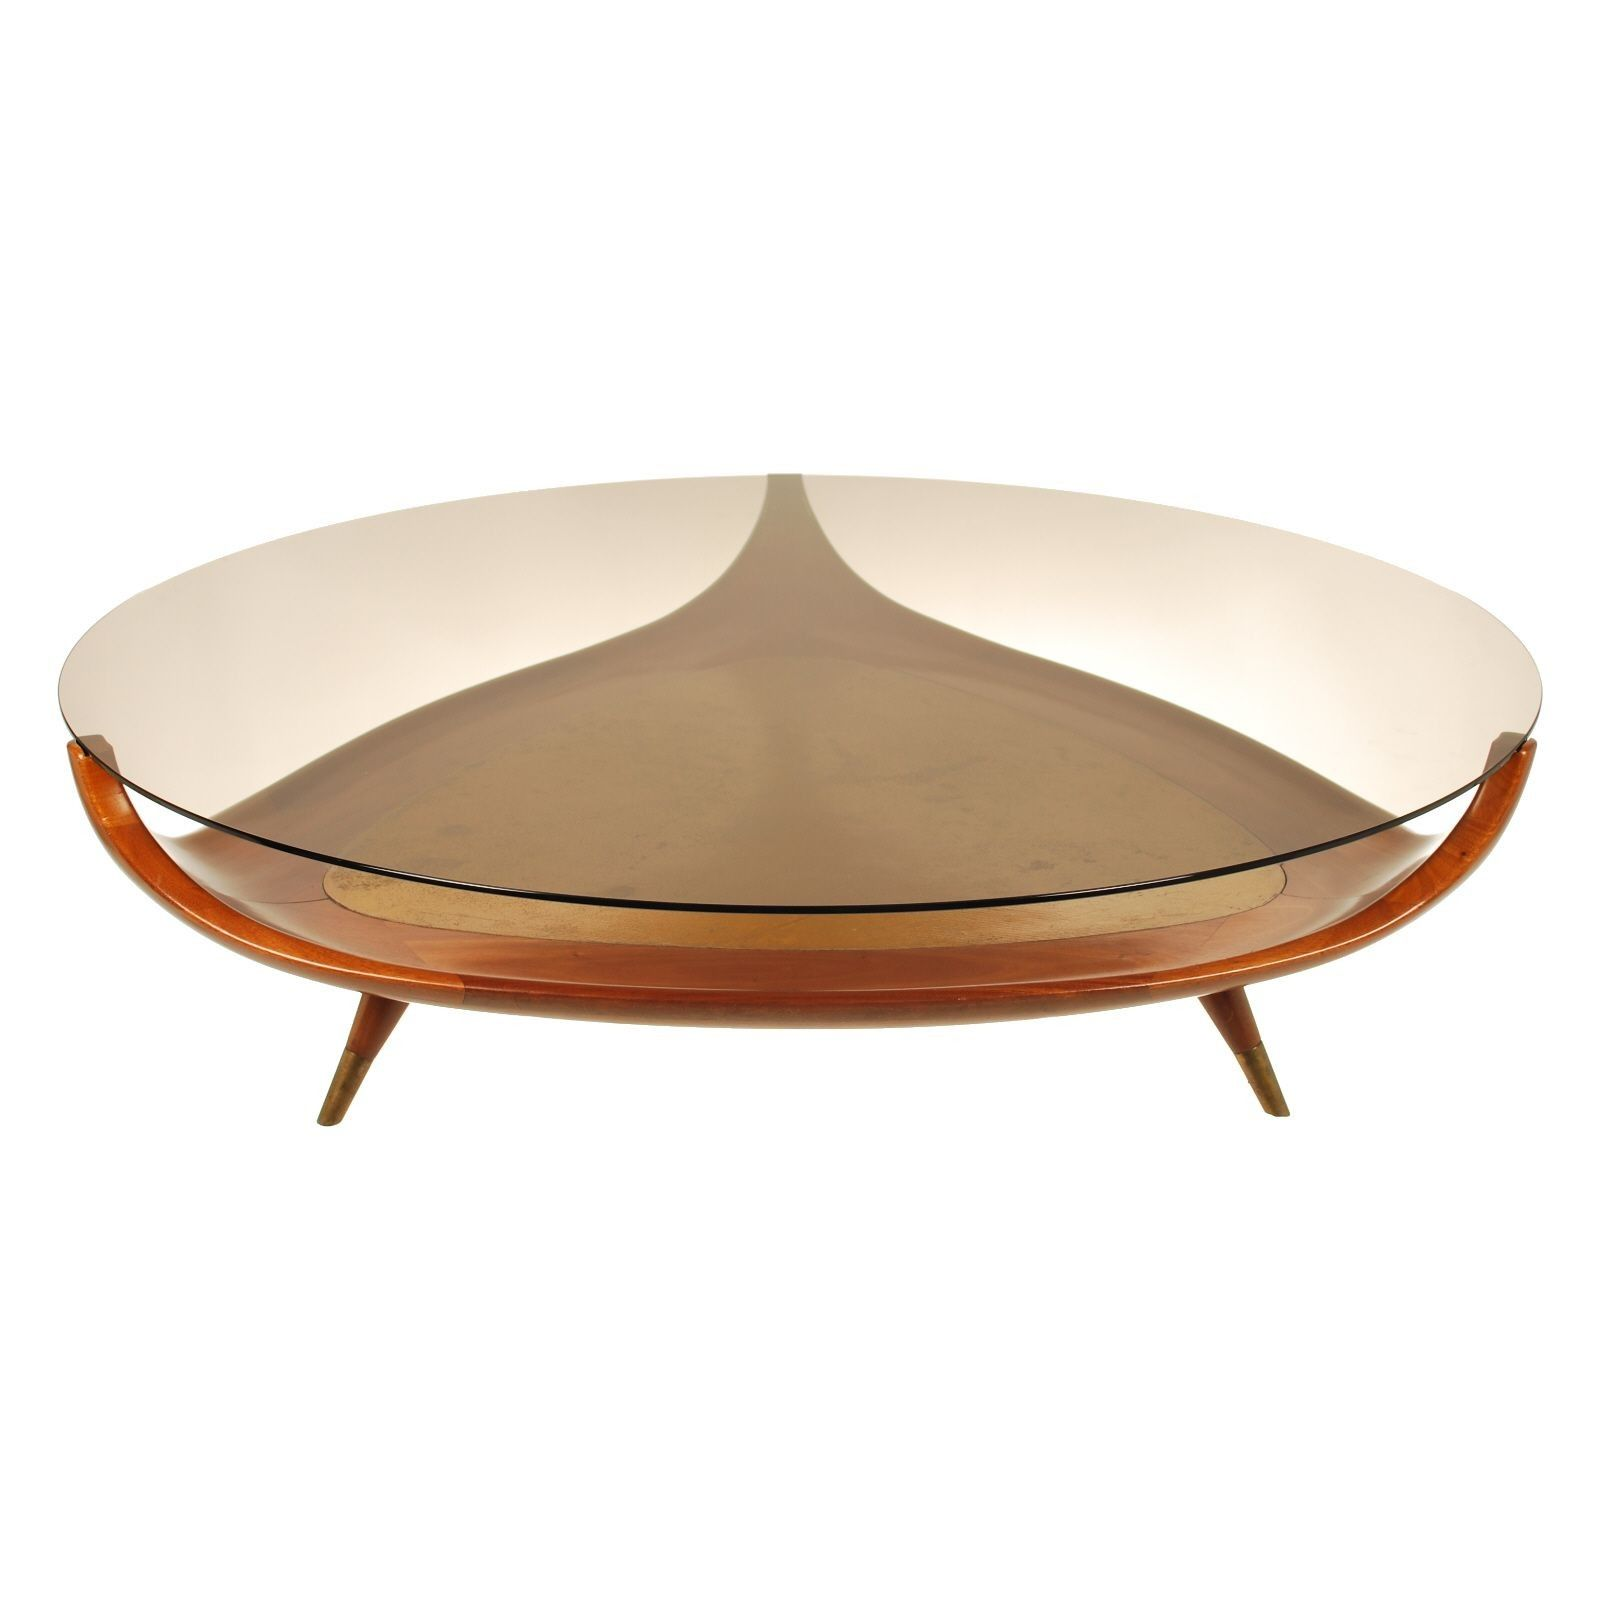 Modern Creative Coffee Tables Design Ideas Round Glass Coffee Table Coffee Table Wood Mid Century Modern Coffee Table [ 1600 x 1600 Pixel ]